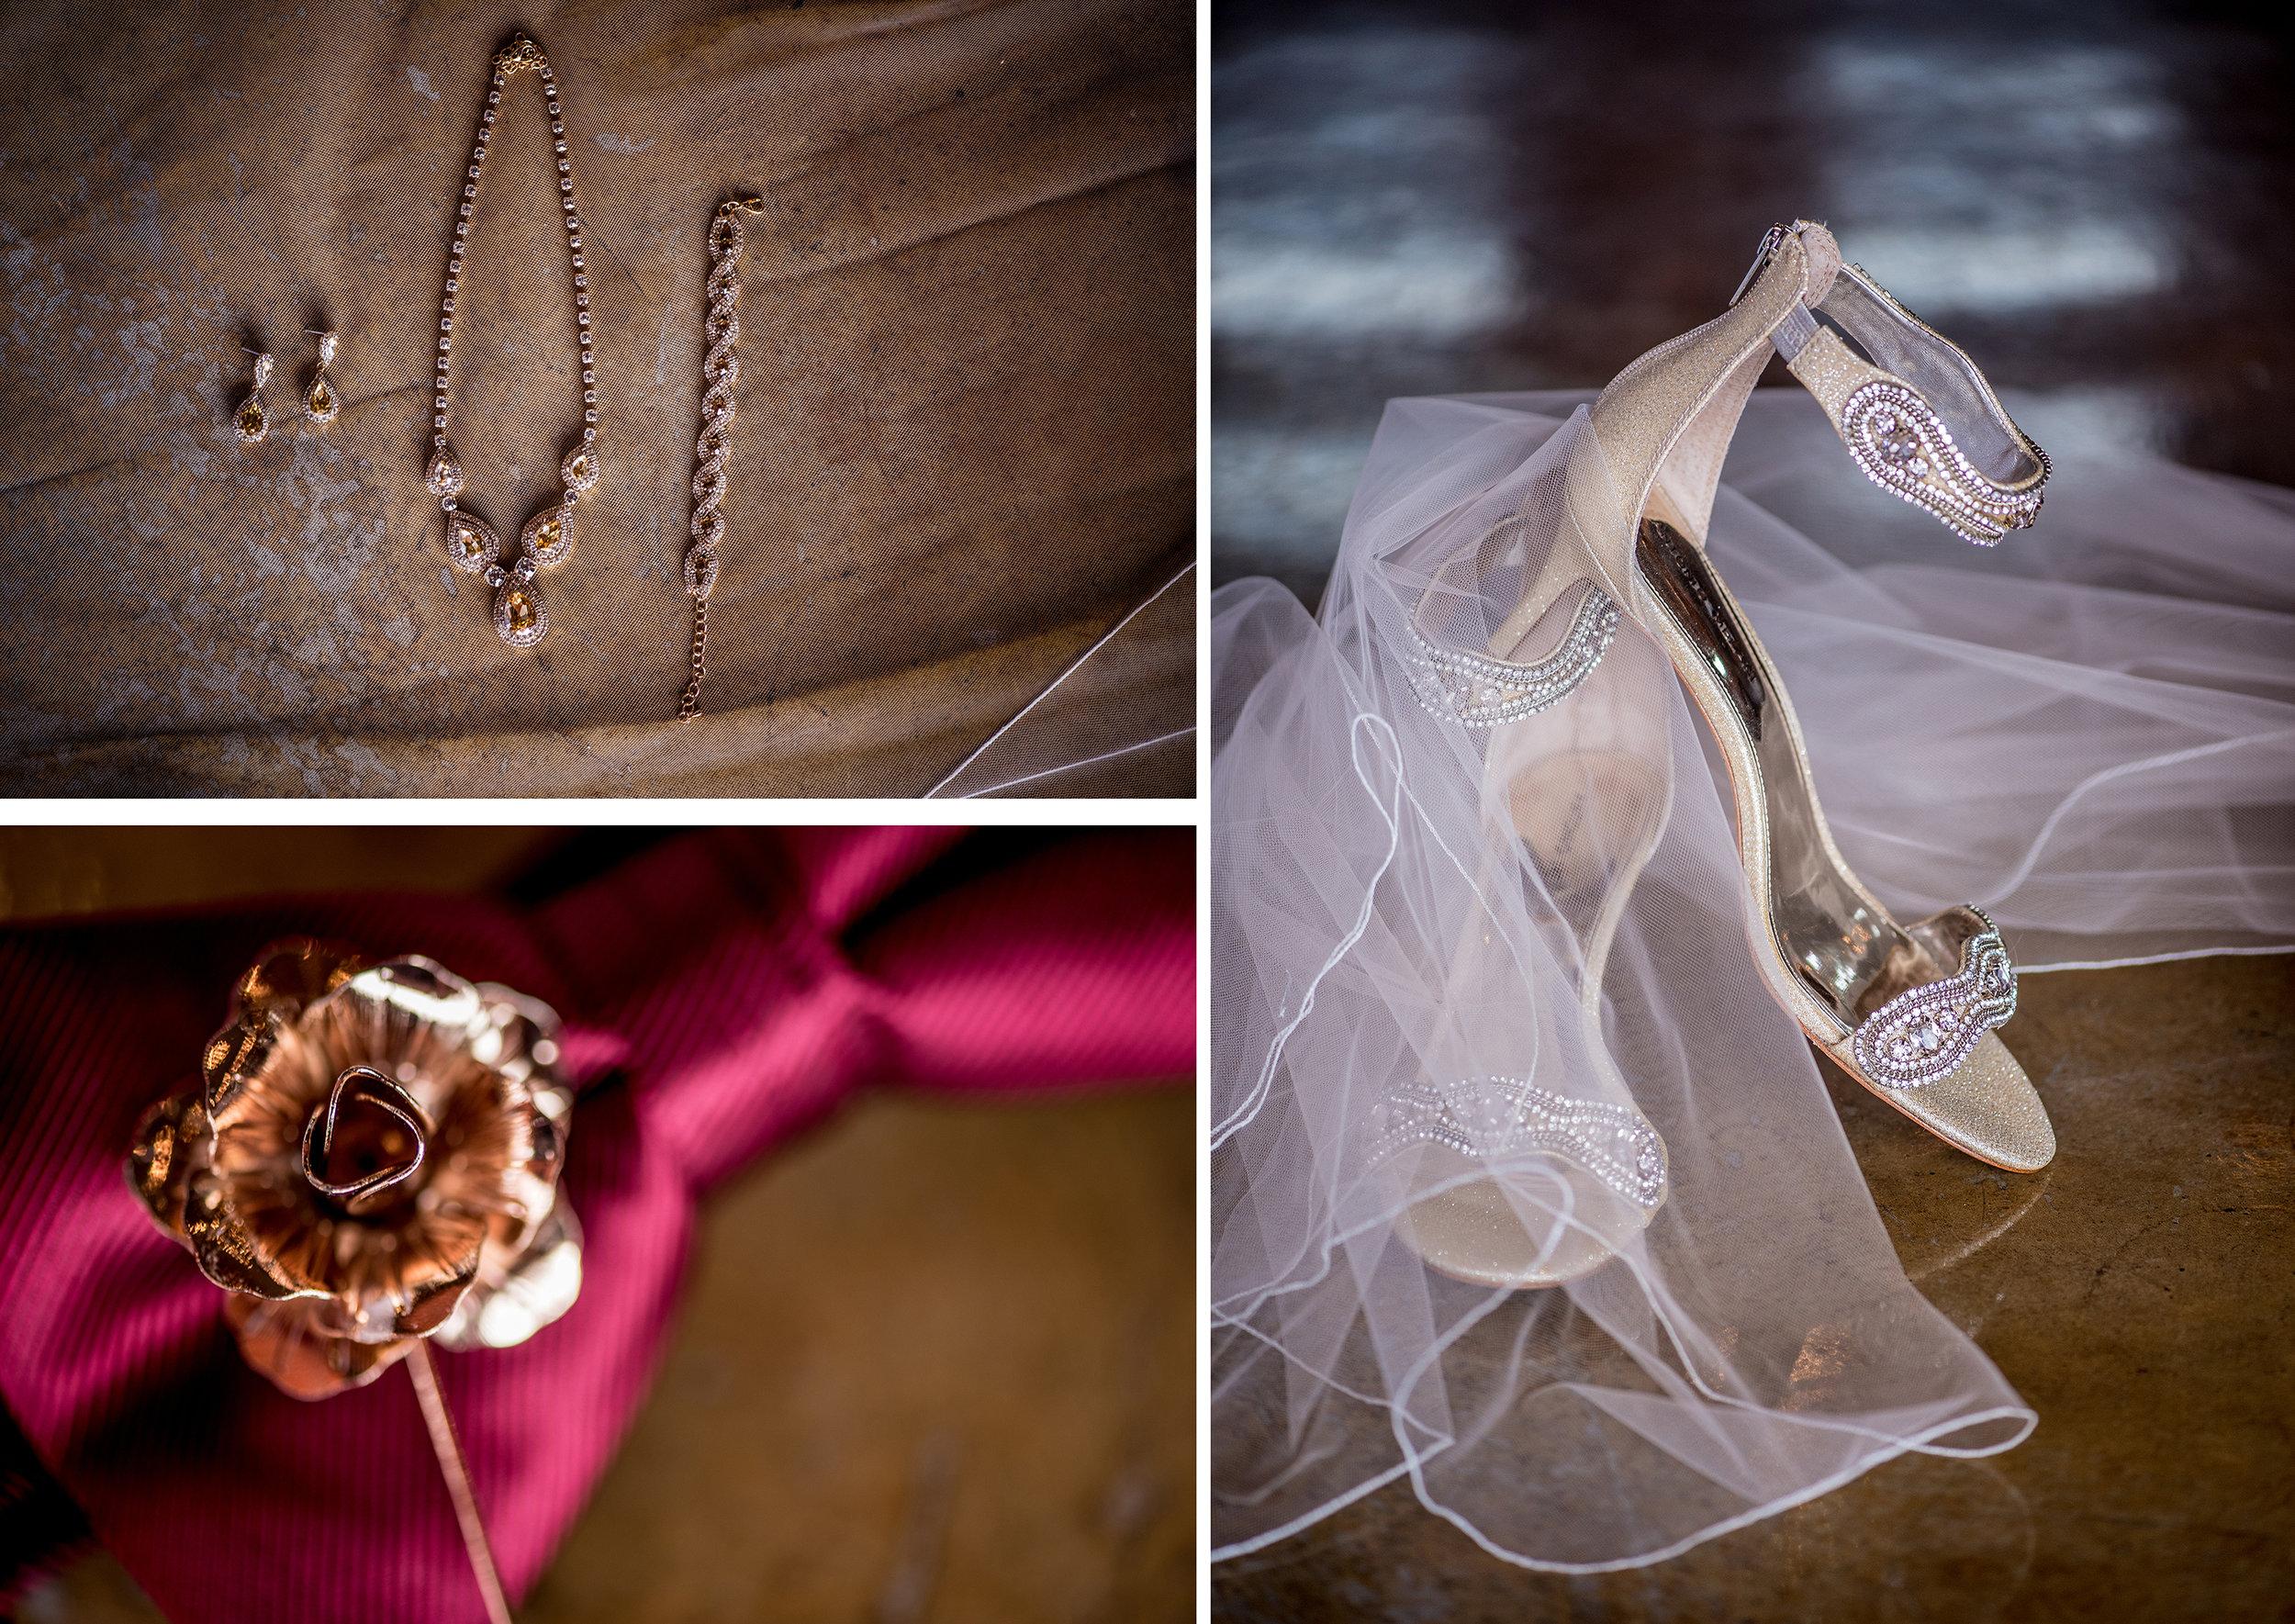 Burlington Iowa Wedding Midwest Photographer Melissa Cervantes _ Chantelle and Isaiah 2.jpg